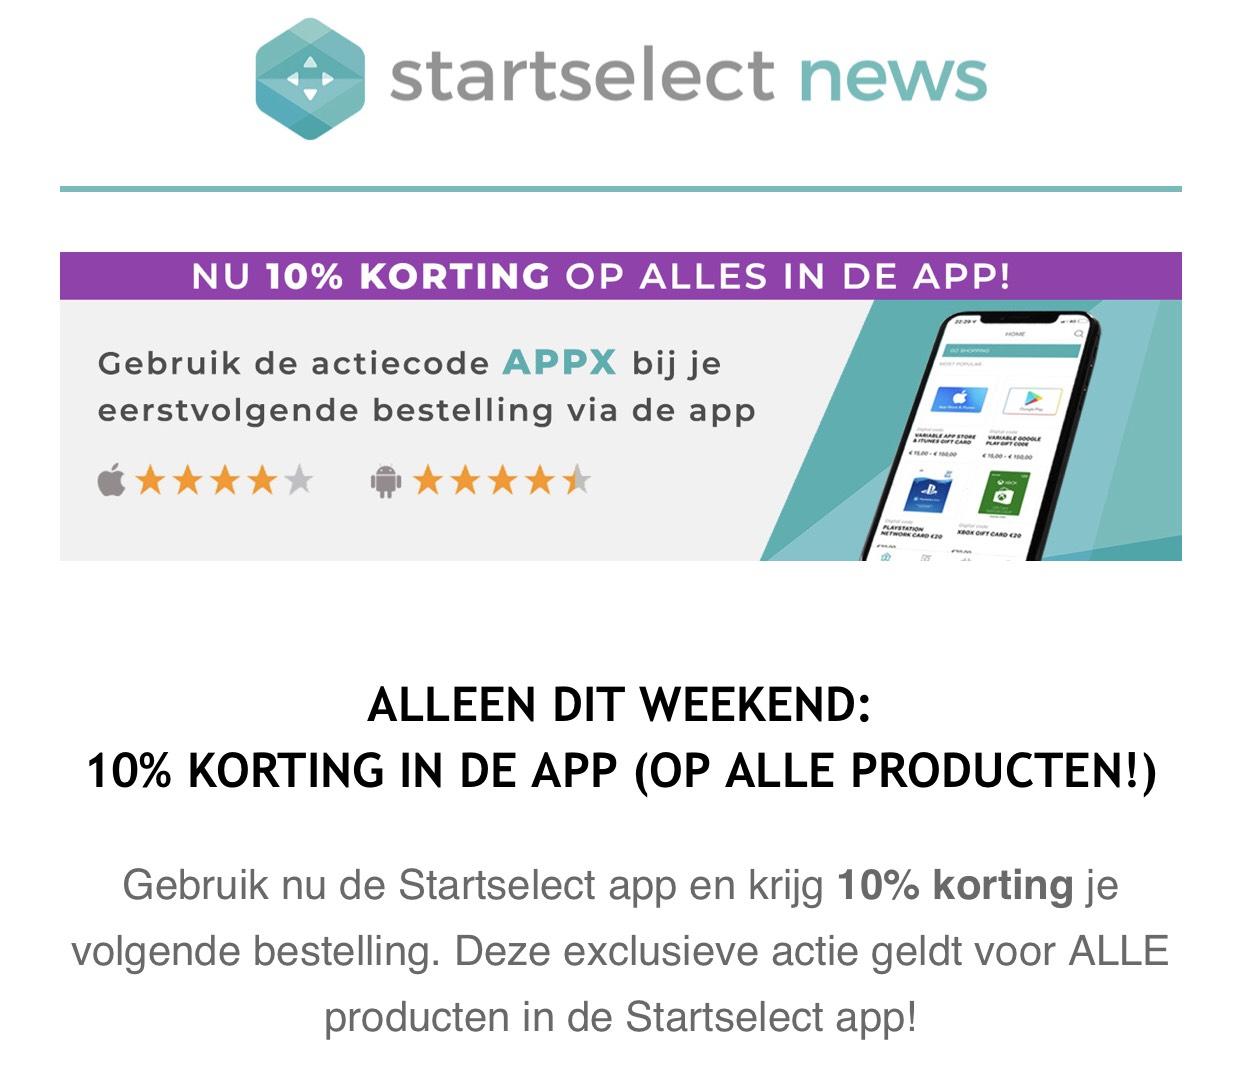 Bij bestelling via app 10% korting - Starselect